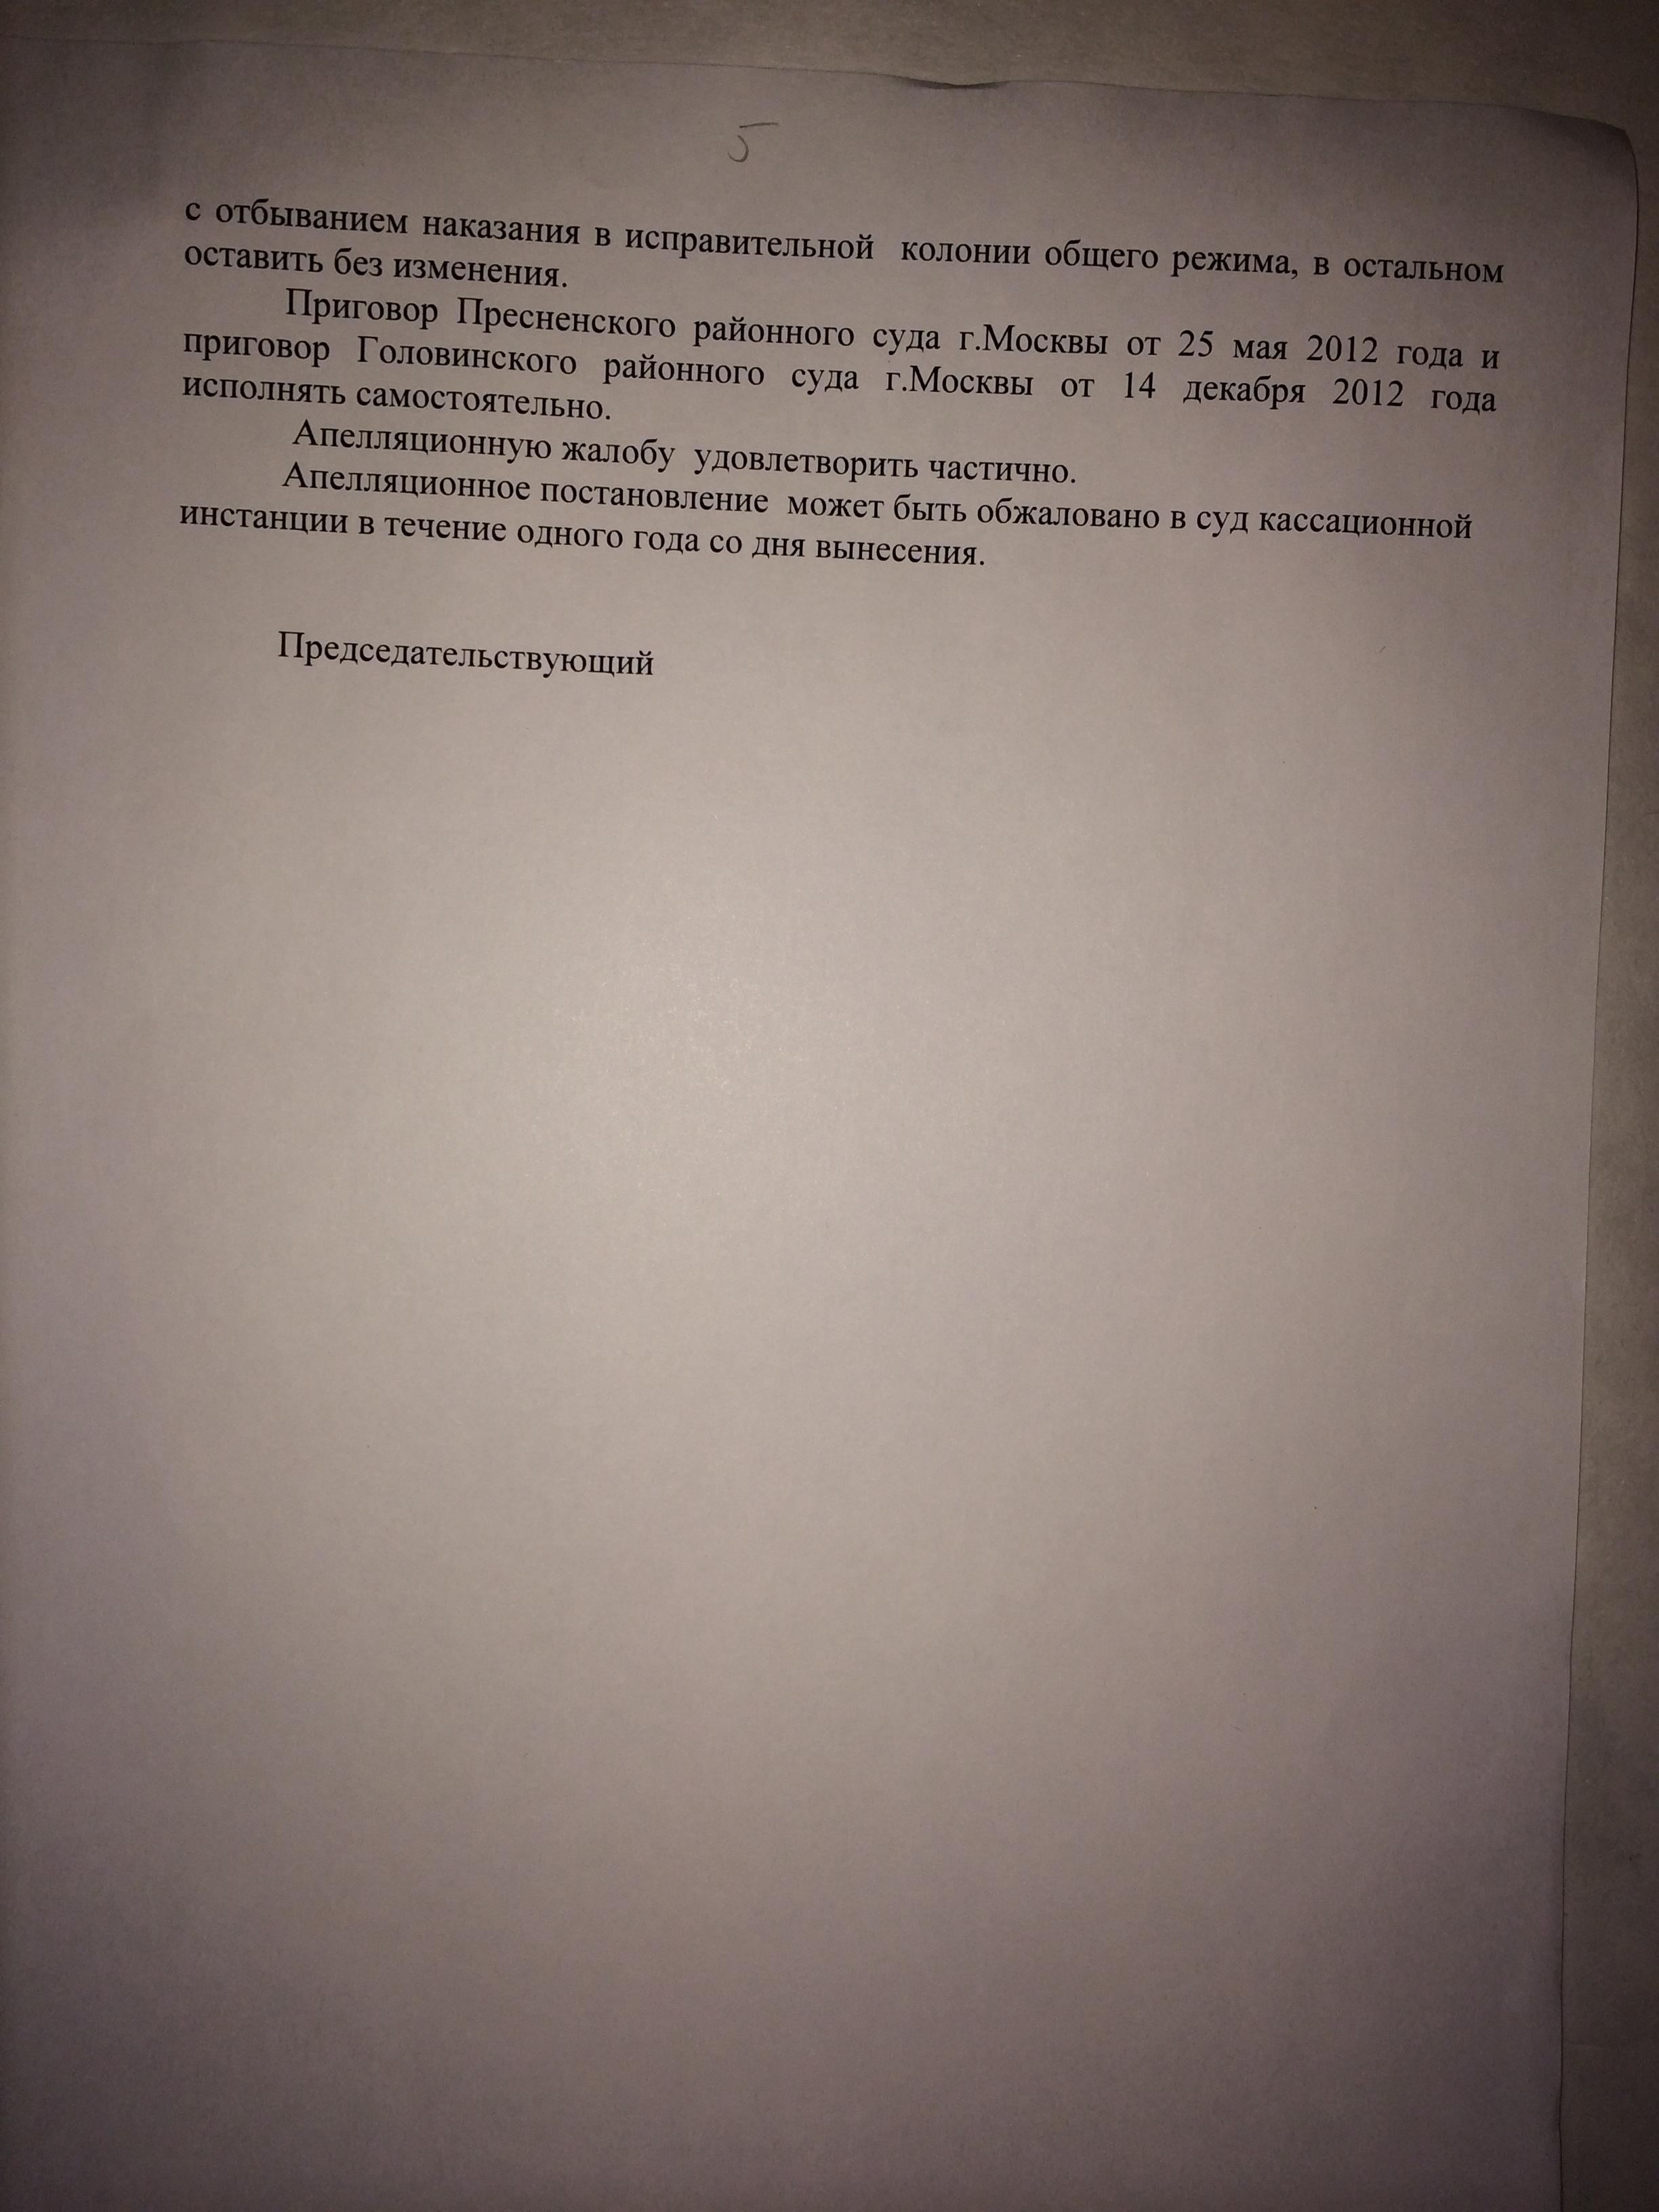 http://s8.uploads.ru/tSOzx.jpg